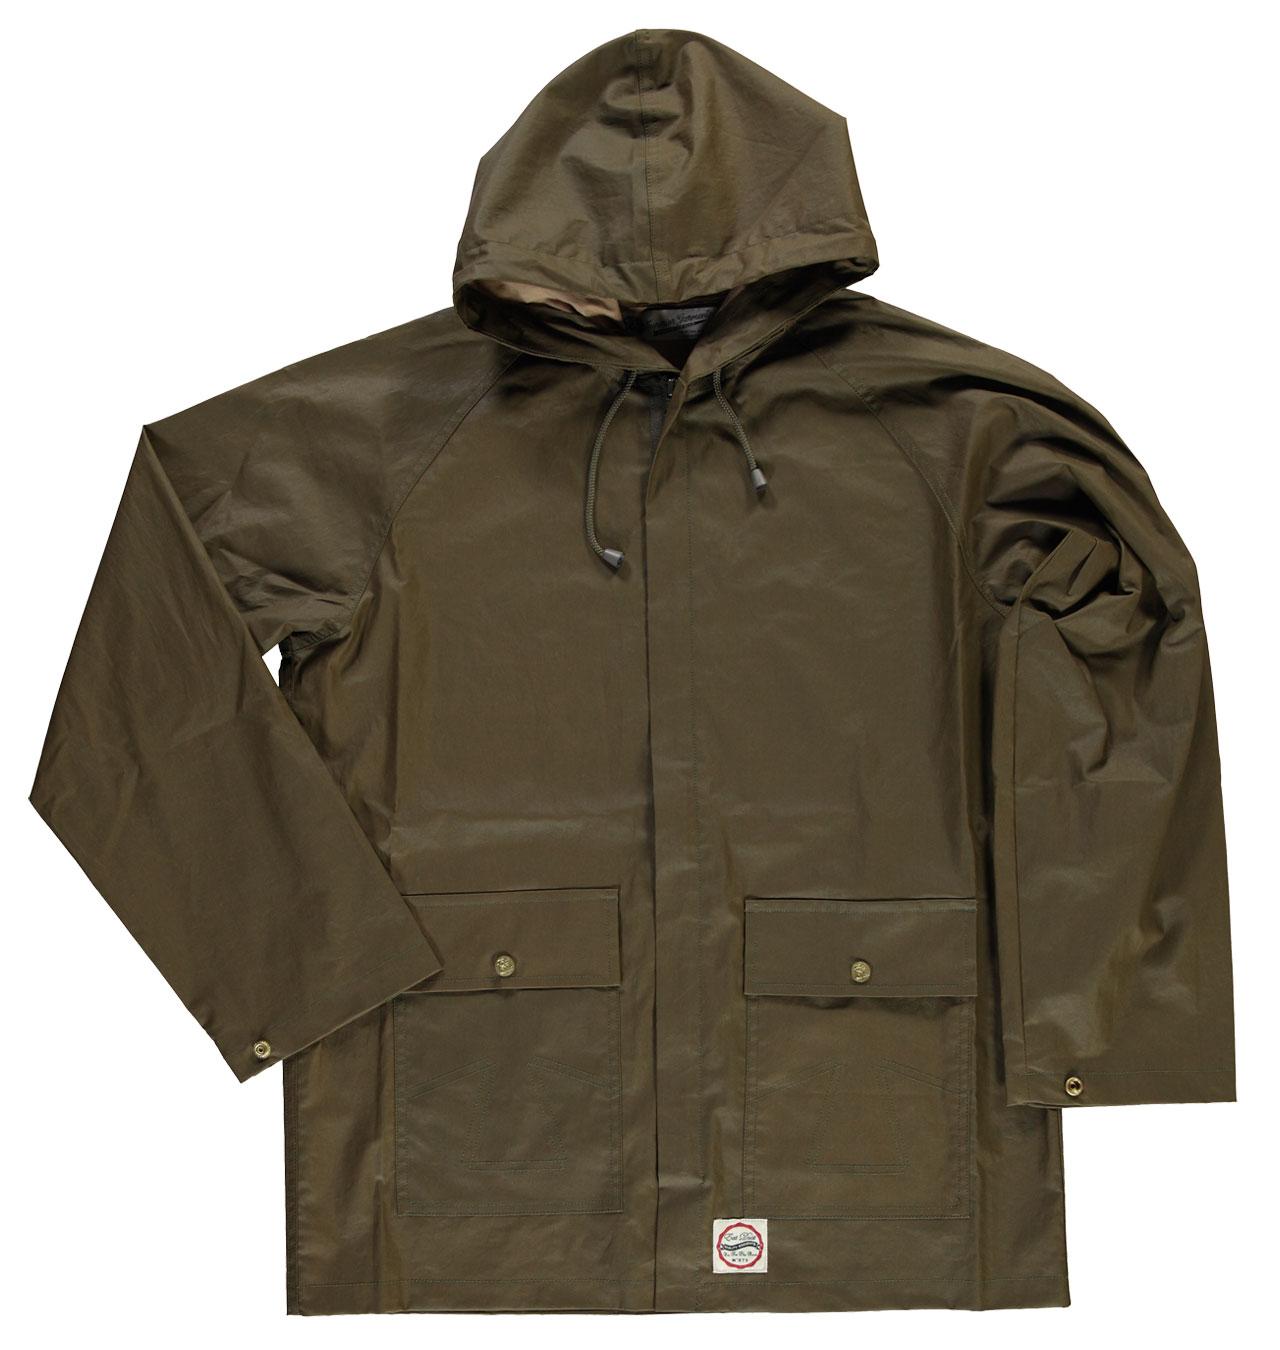 2c007fabf9a Eat Dust - Fisherman Jacket Waxed - Dark Olive